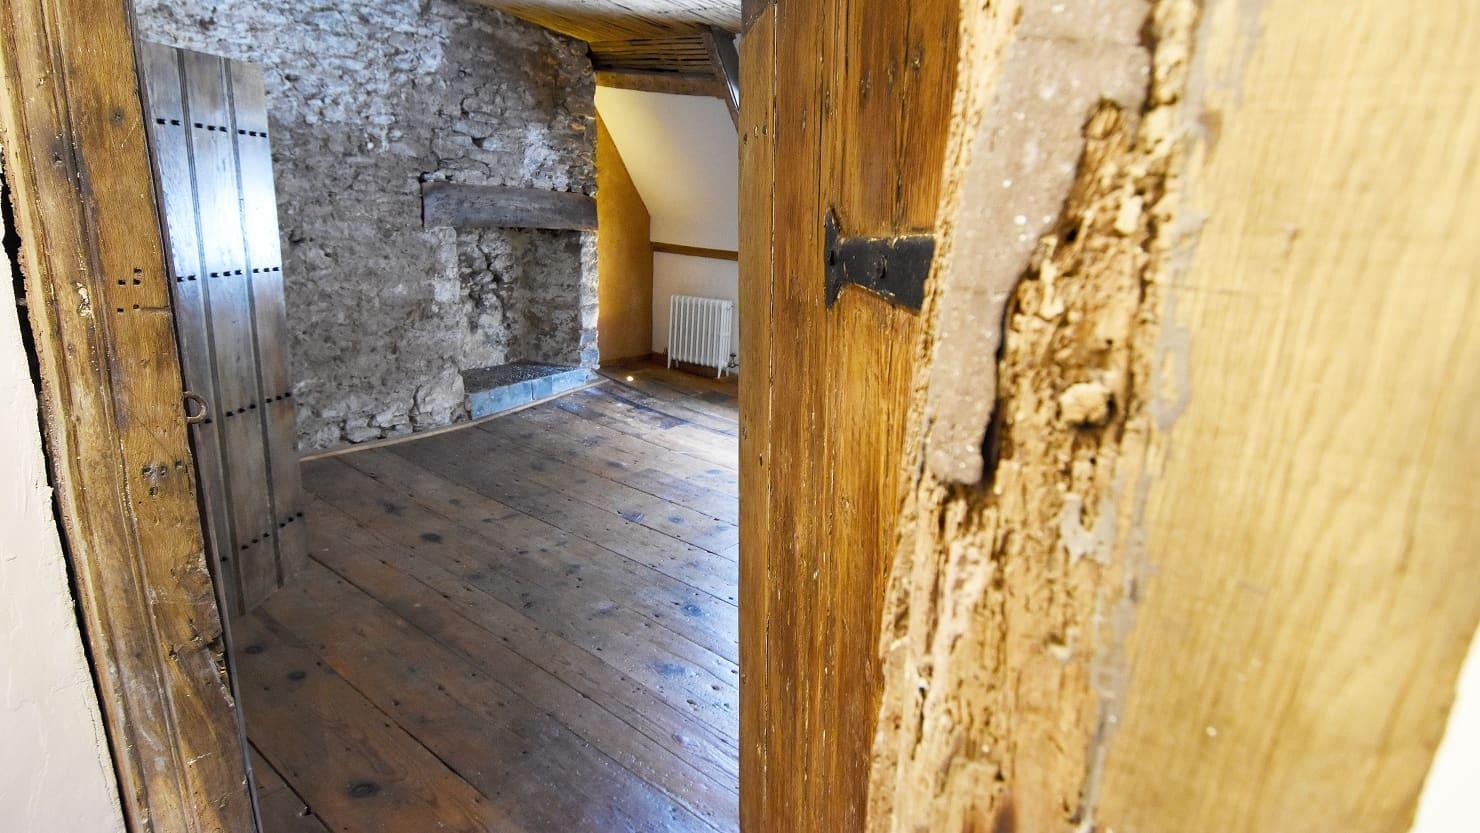 Interior of Elizabethan House - second floor